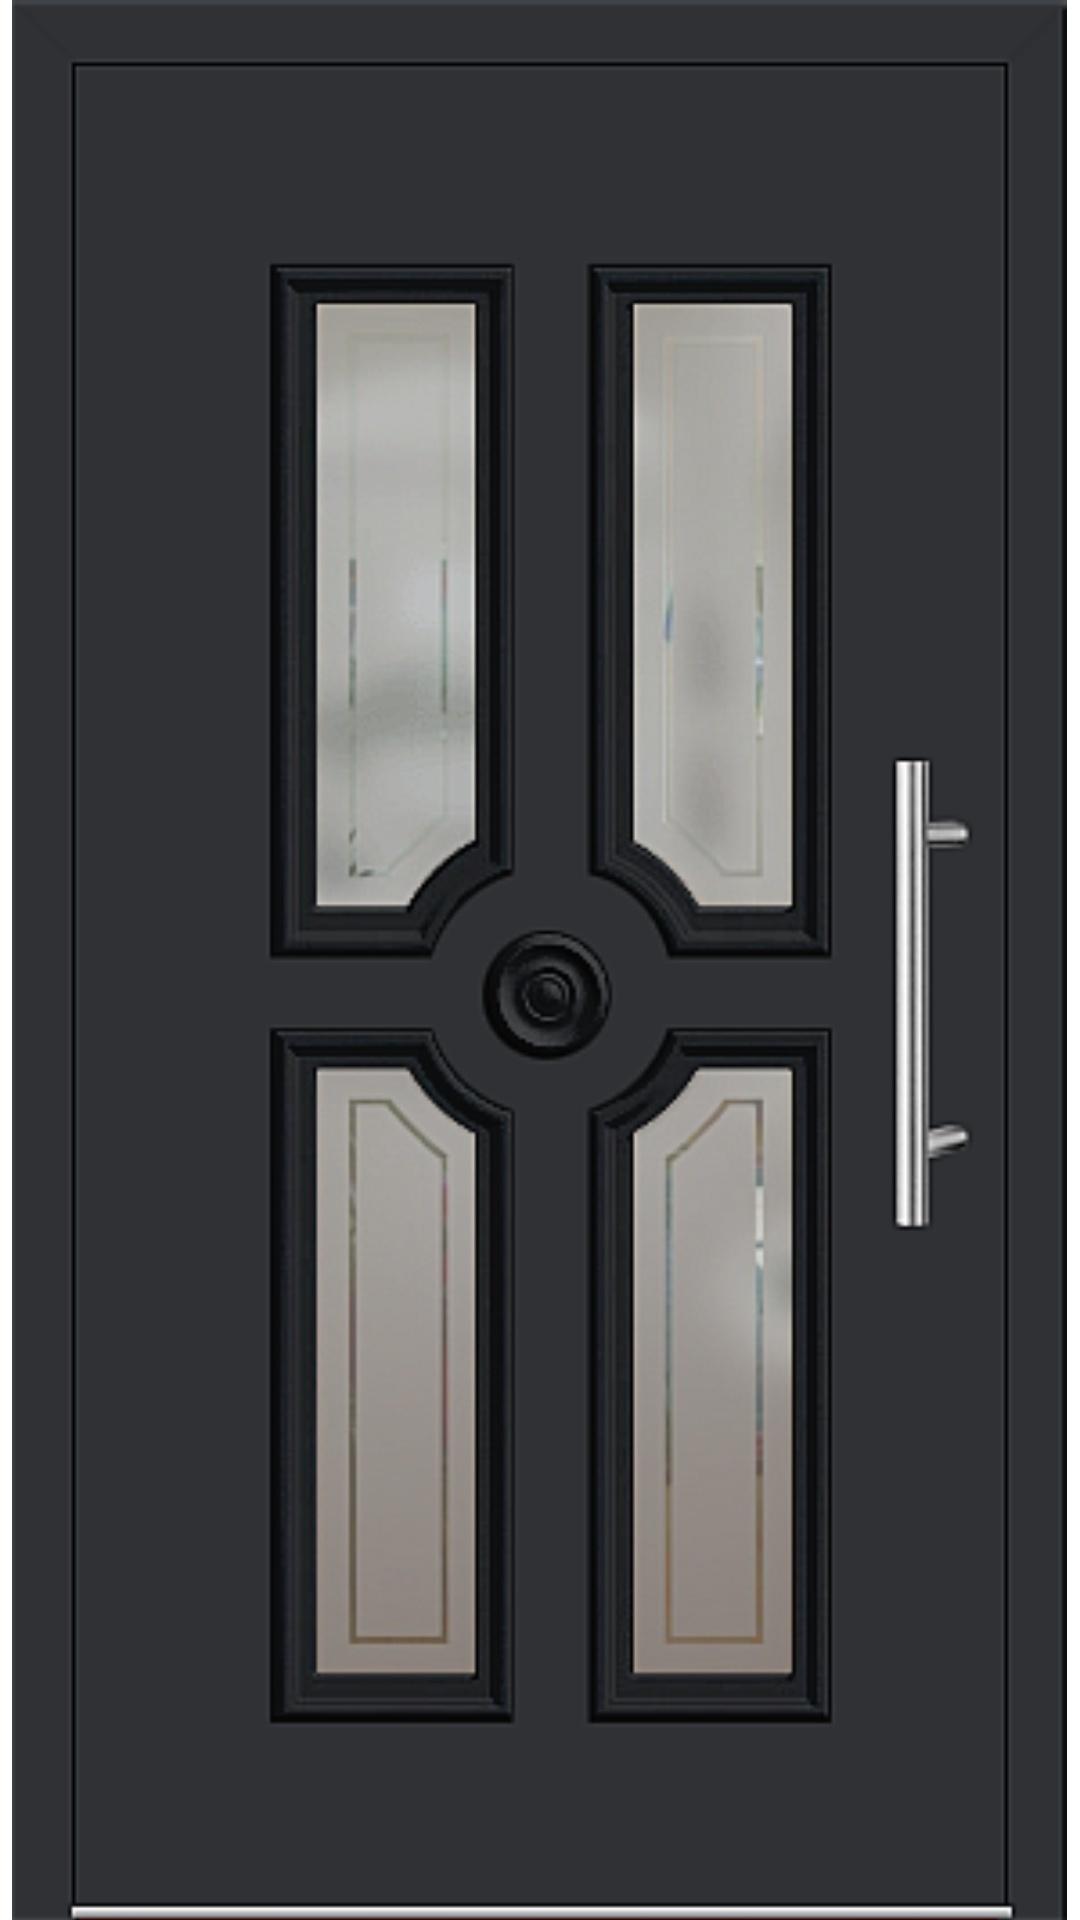 Aluminium Haustür Modell 208-20 schwarz